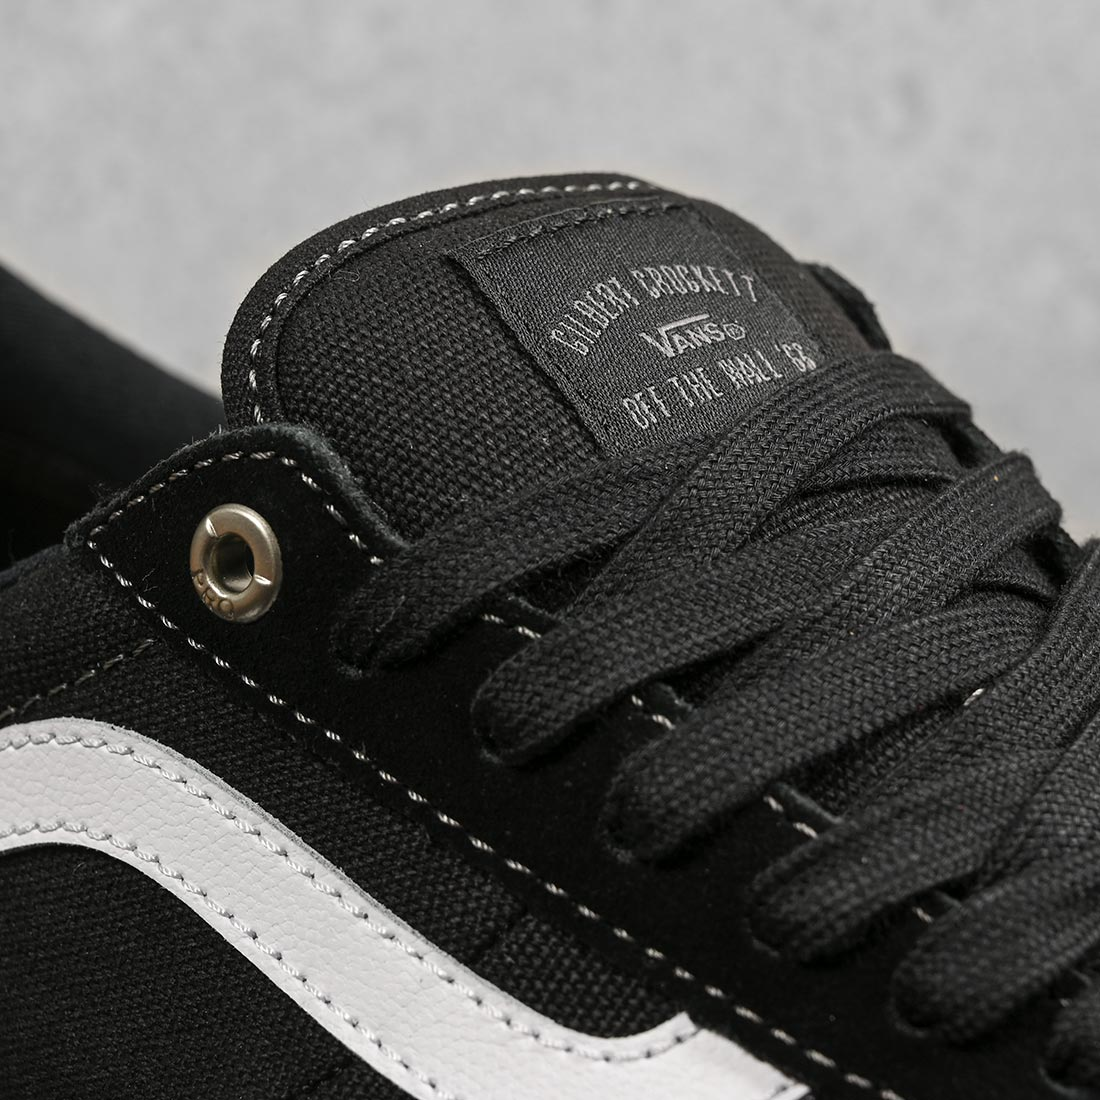 Vans Gilbert Crockett Pro Skate Shoes